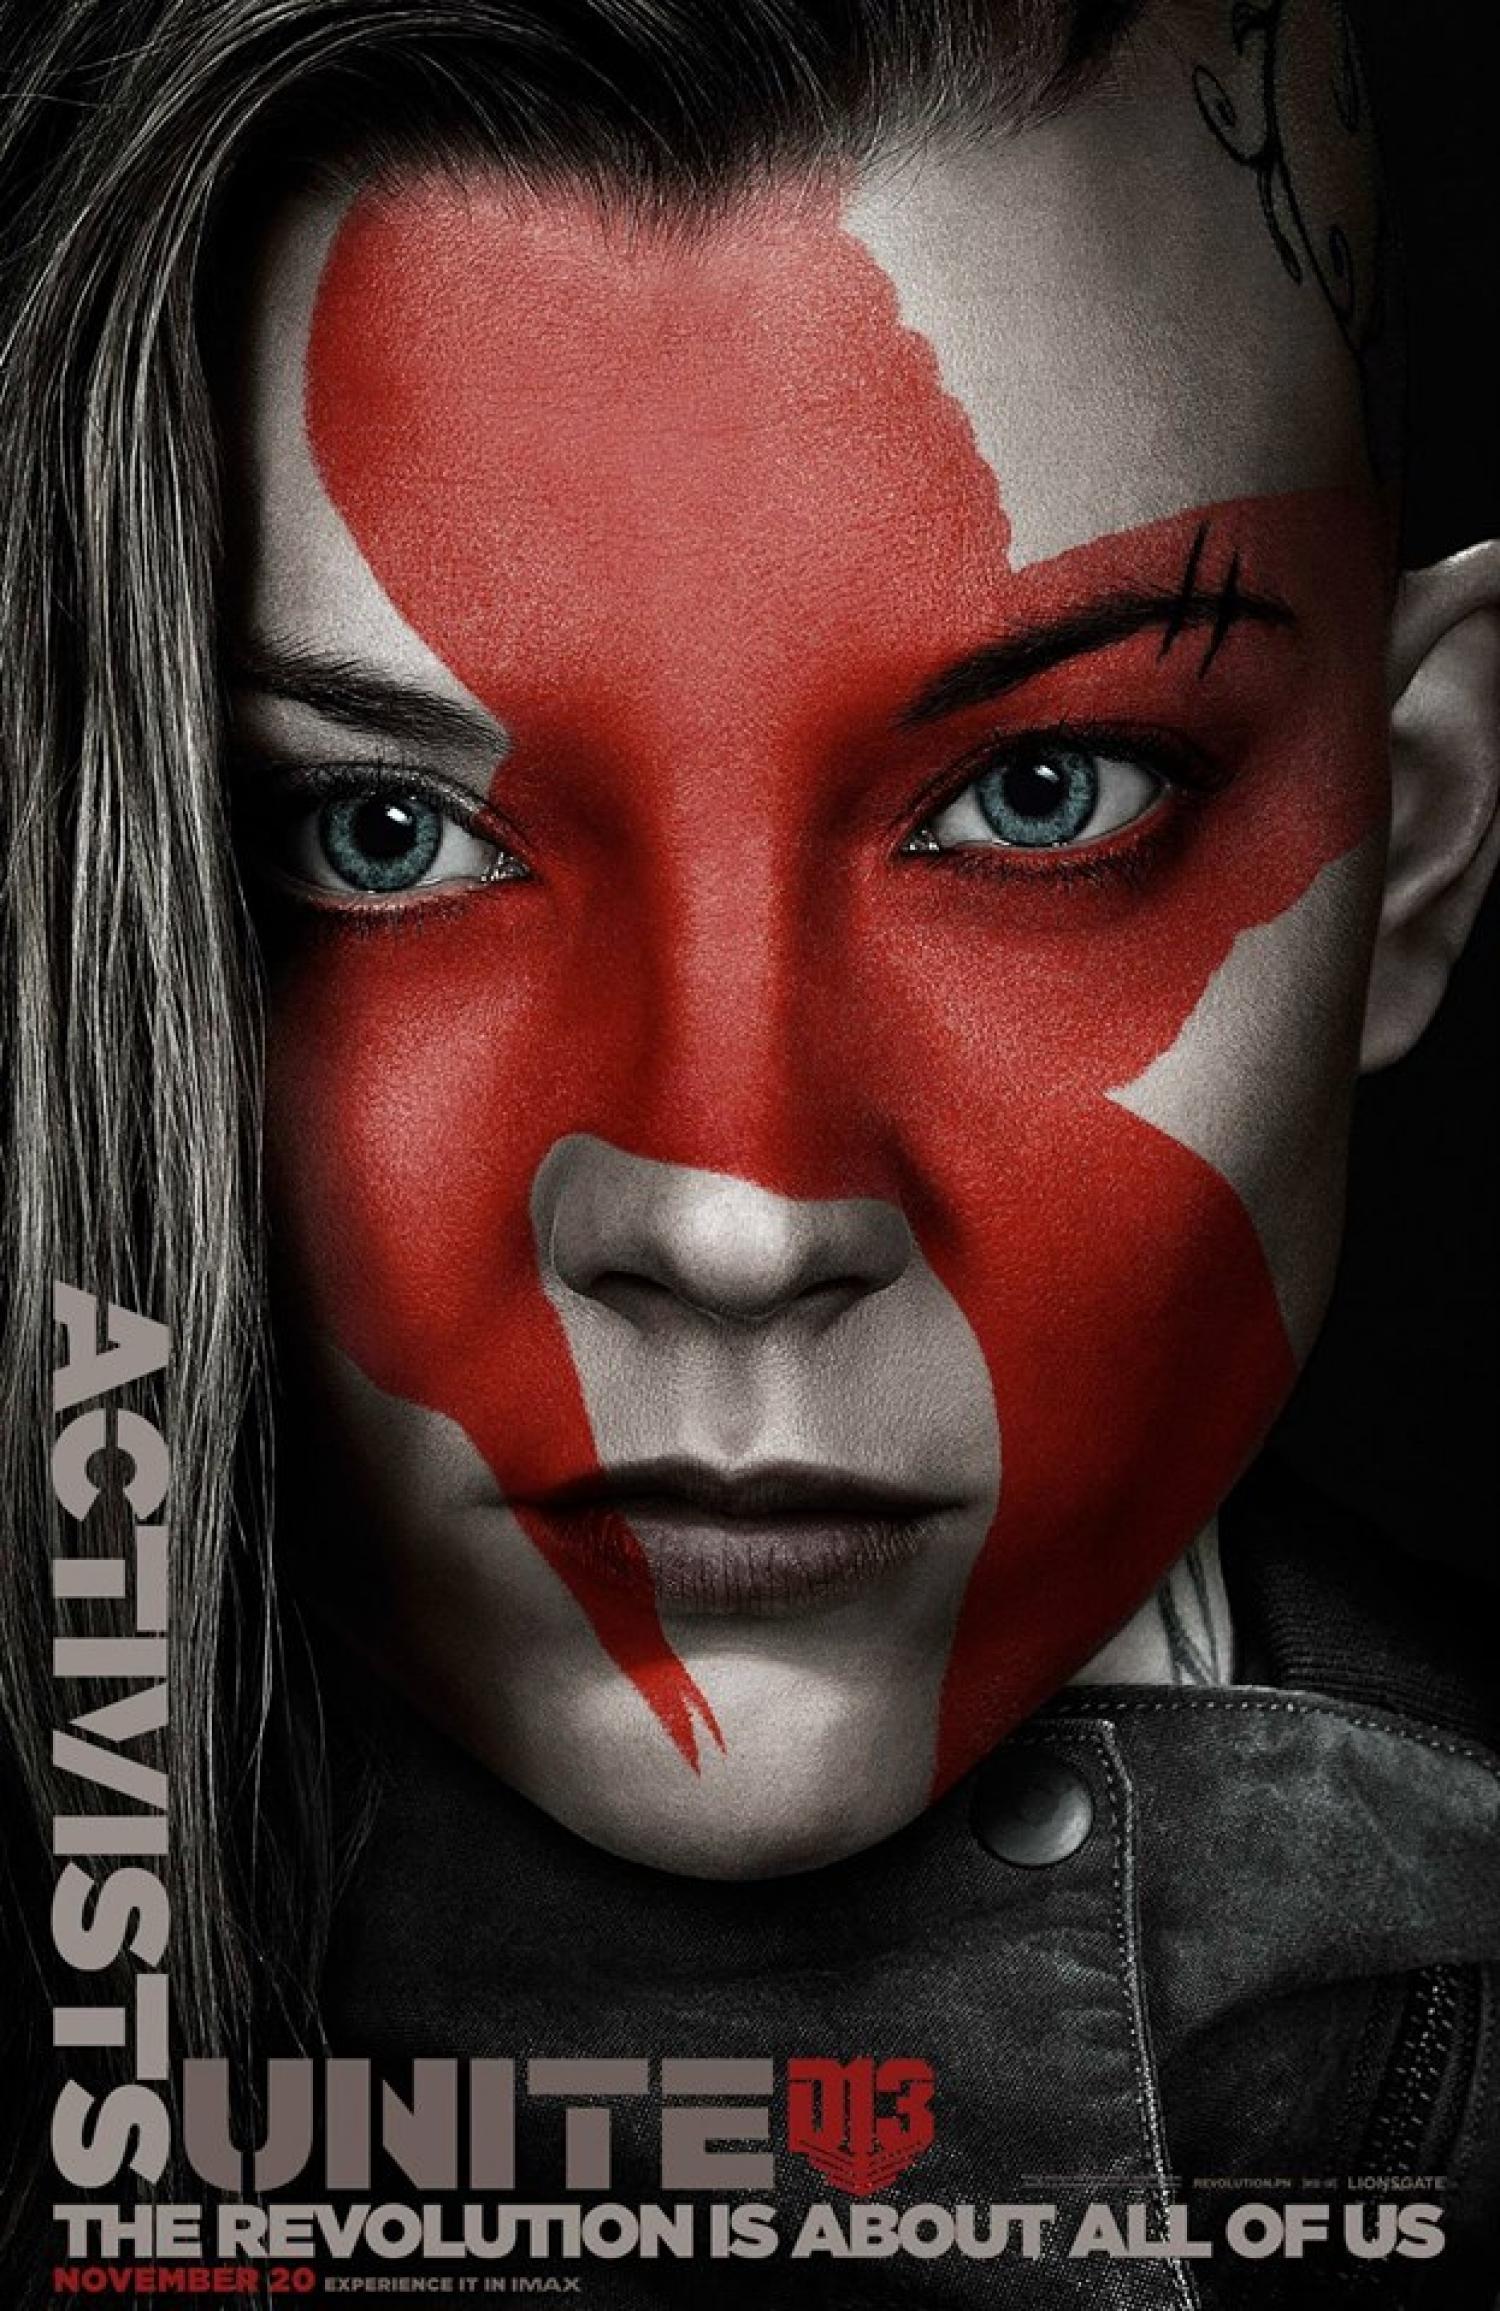 Trailer for The Hunger Games: Mockingjay - Part 2